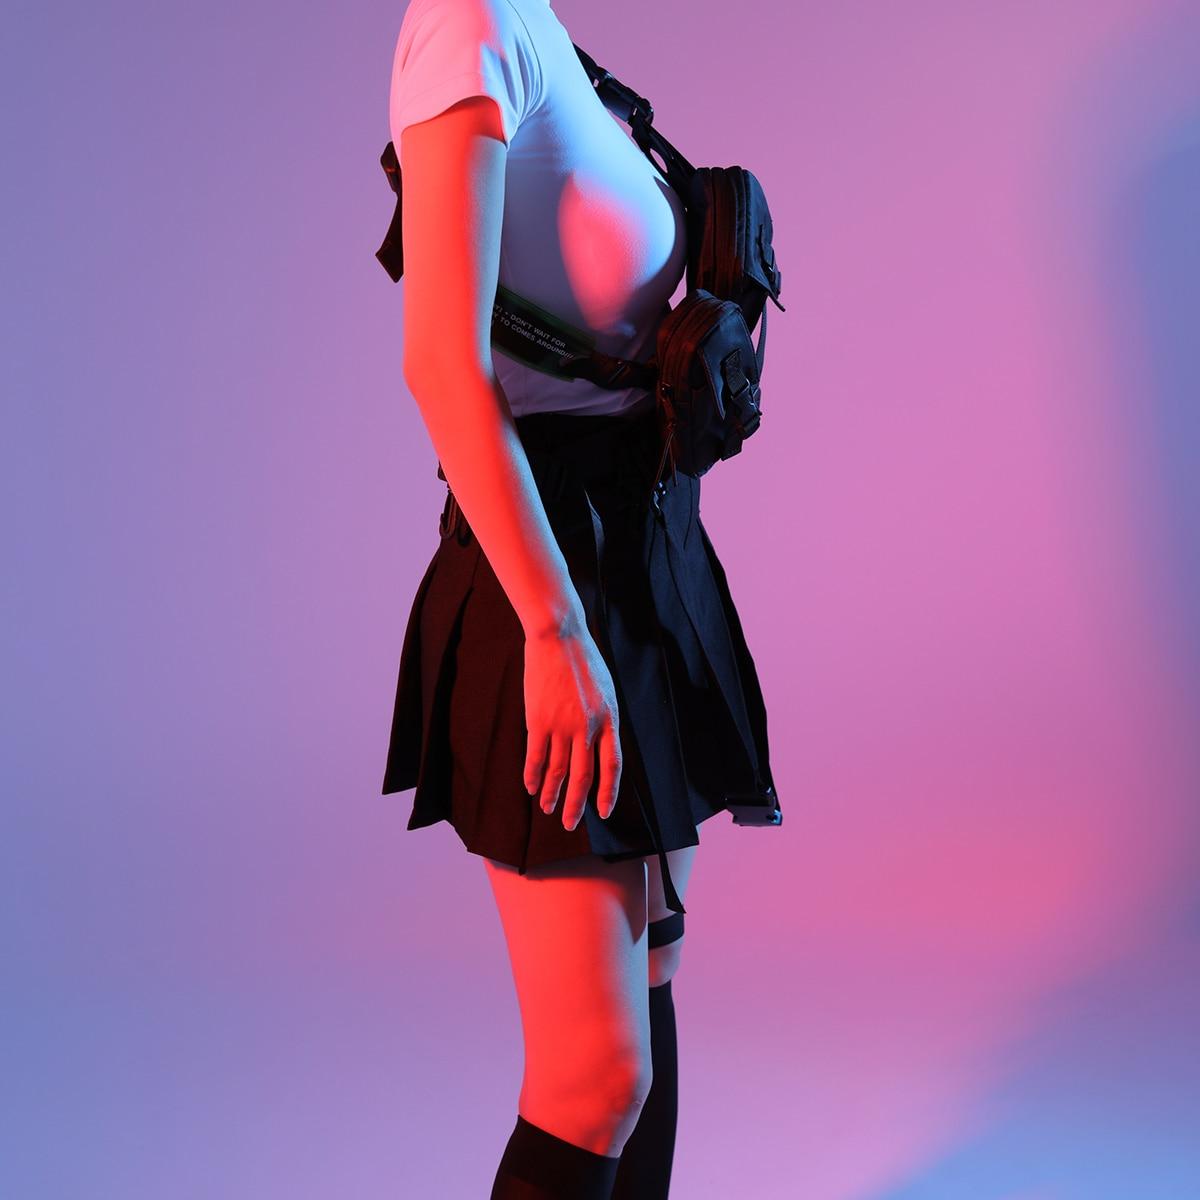 peito tático hip saco moda streetwear pacote